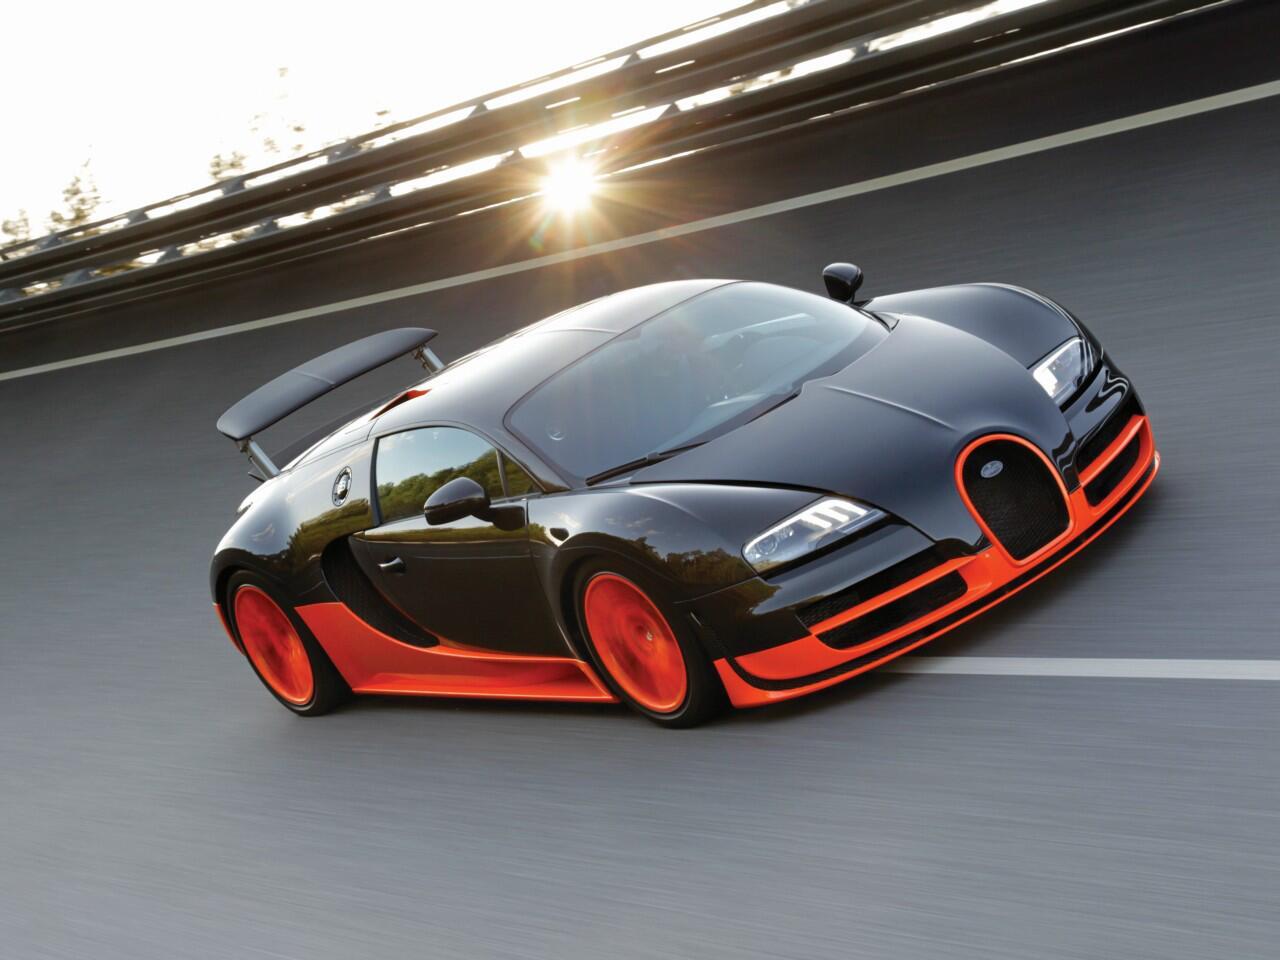 Bild zu Bugatti Veyron 16.4 Super Sport